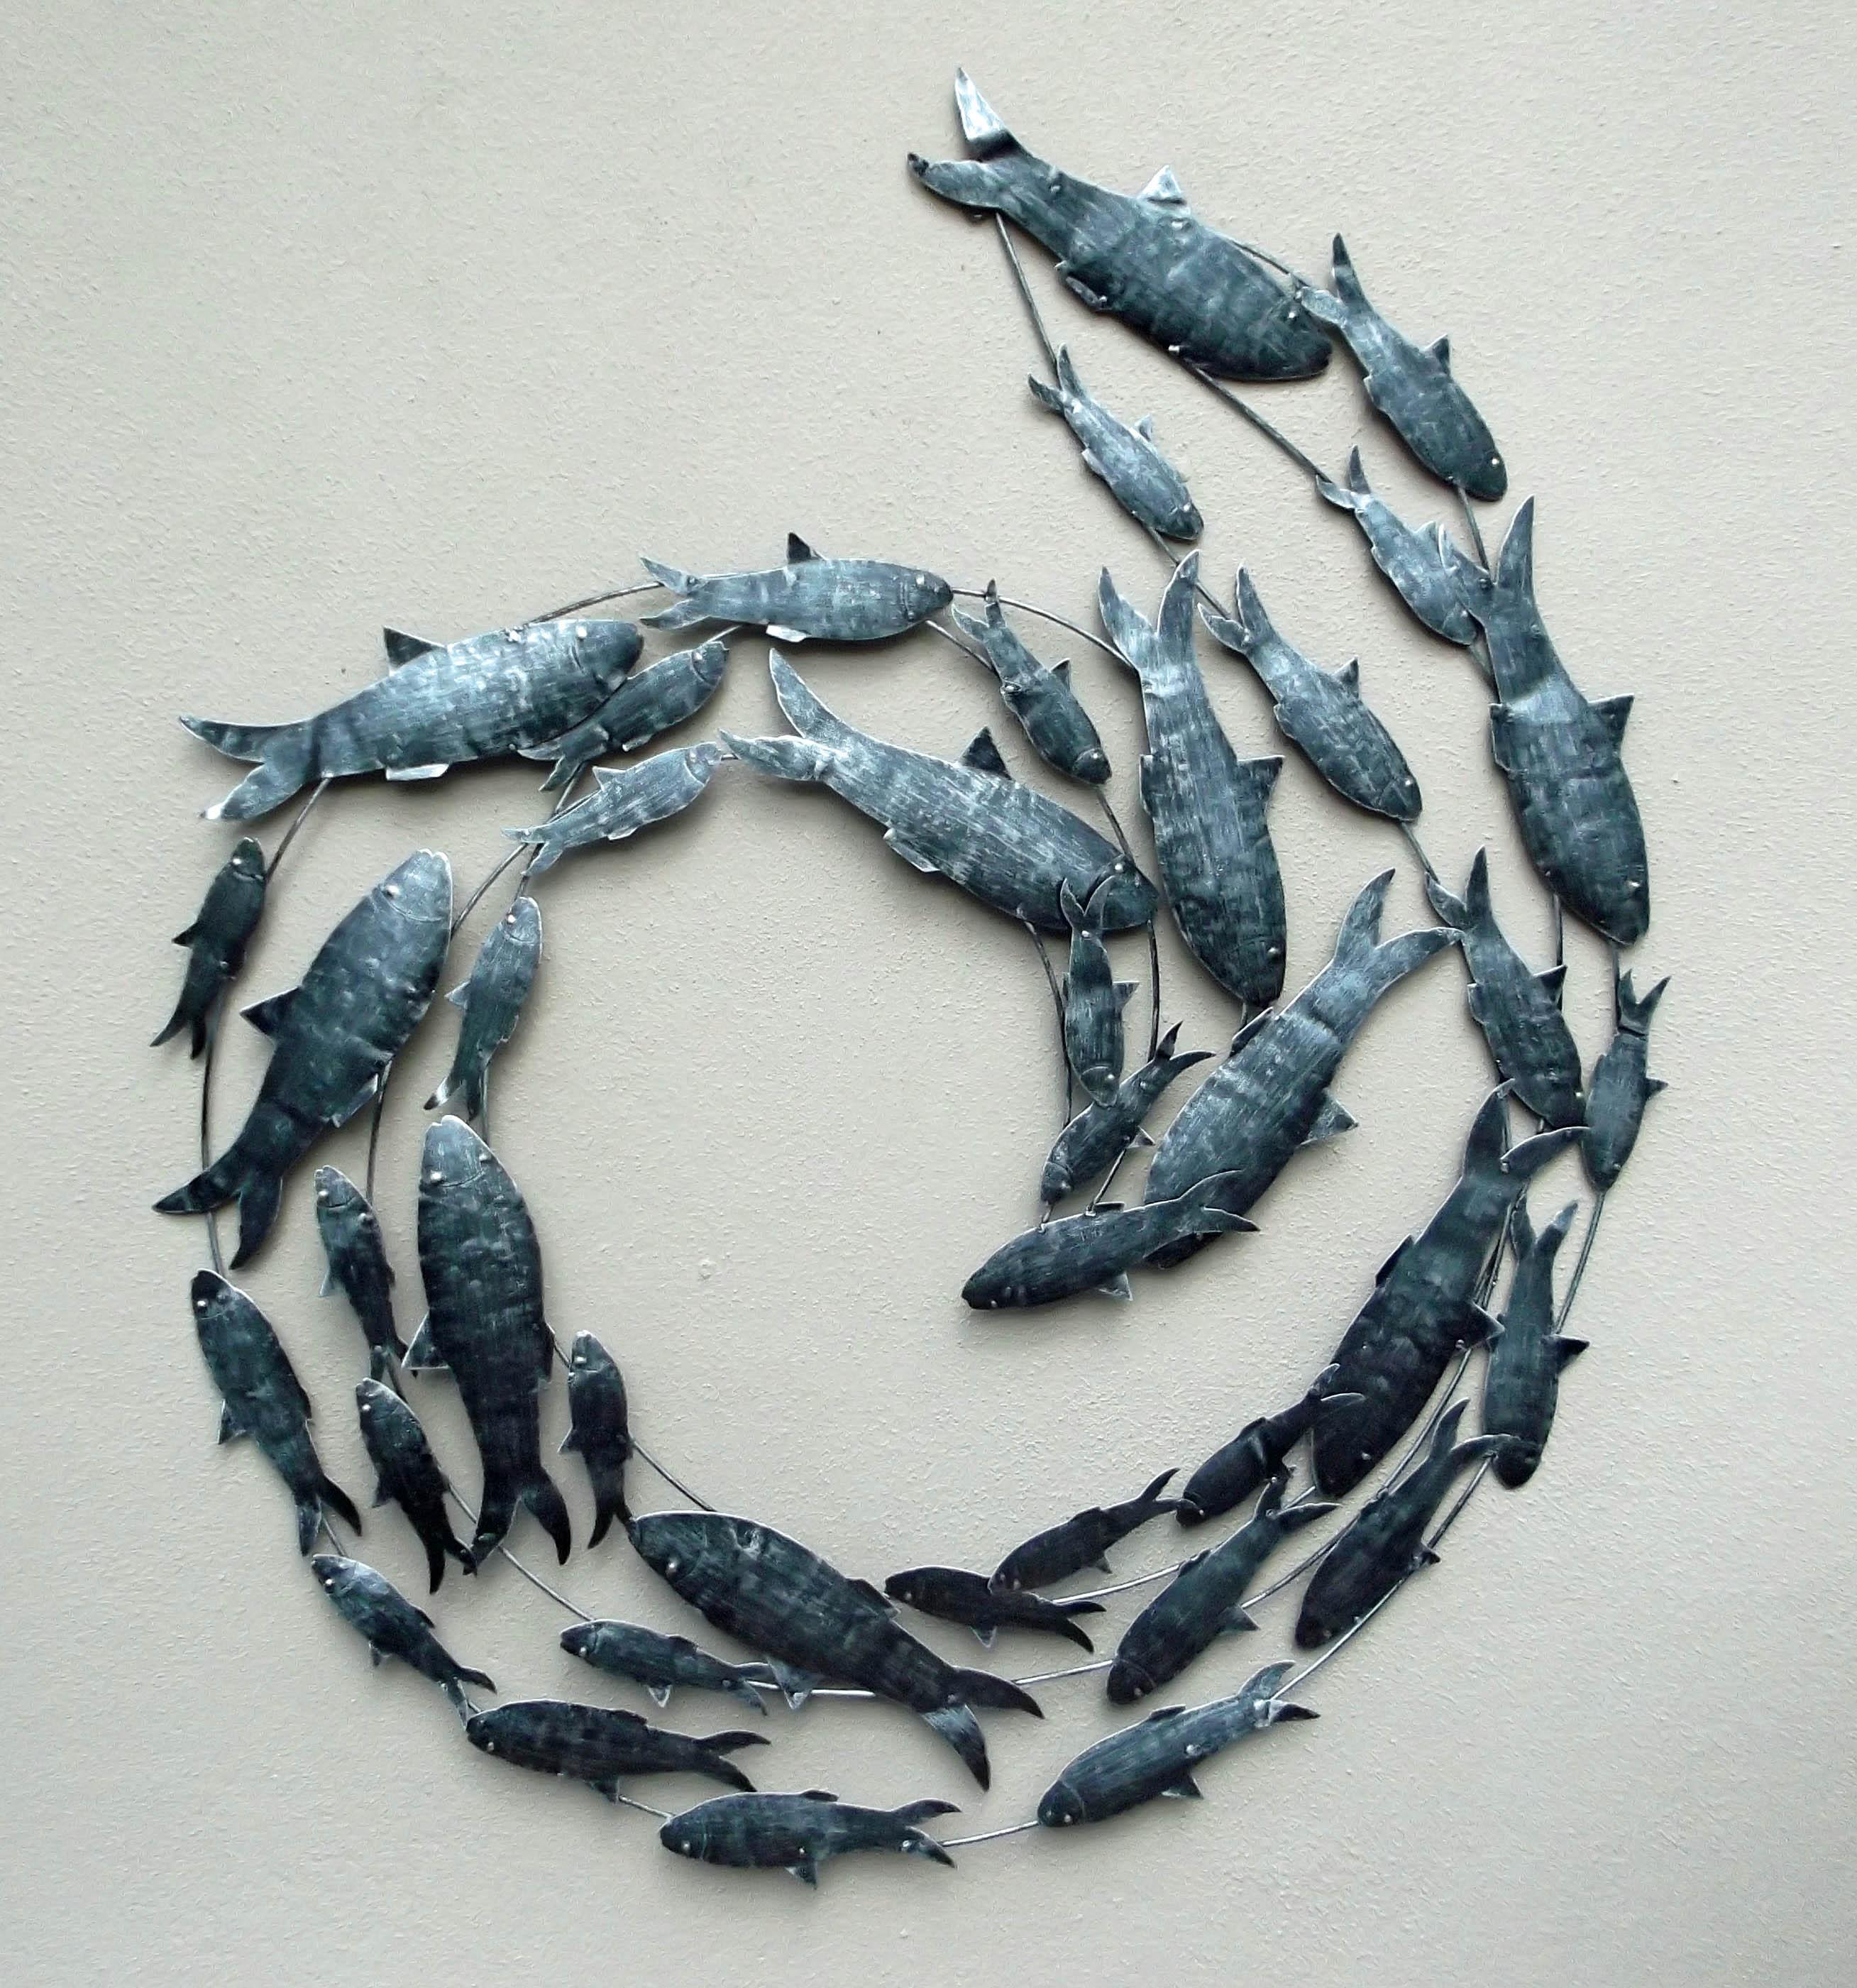 Wall Art Fish Circle – Blogstodiefor Inside Fish Shoal Wall Art (View 18 of 20)